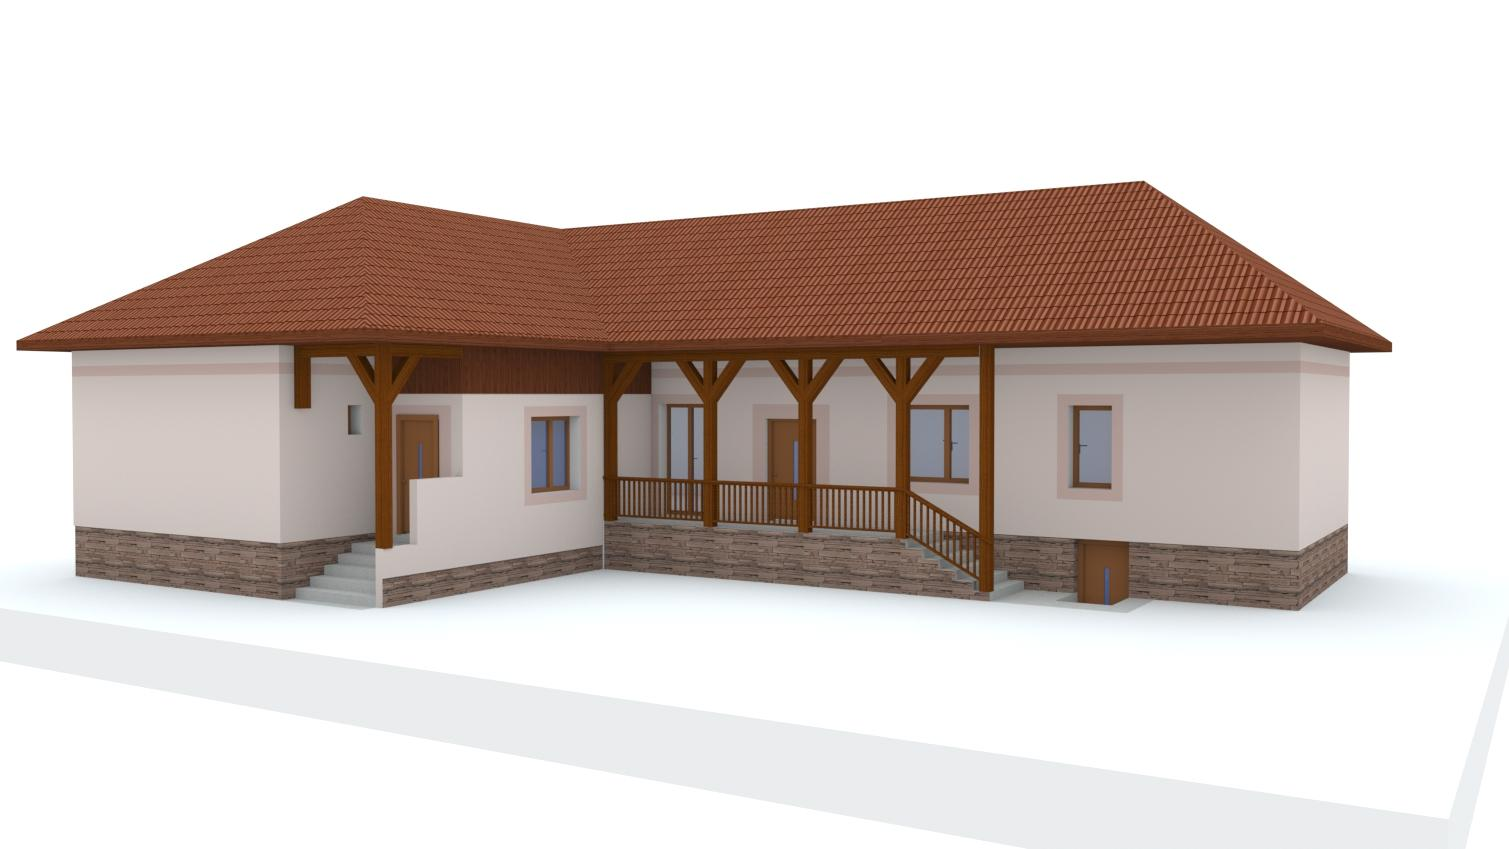 Návrh fasády rodinného domu - Obrázok č. 24